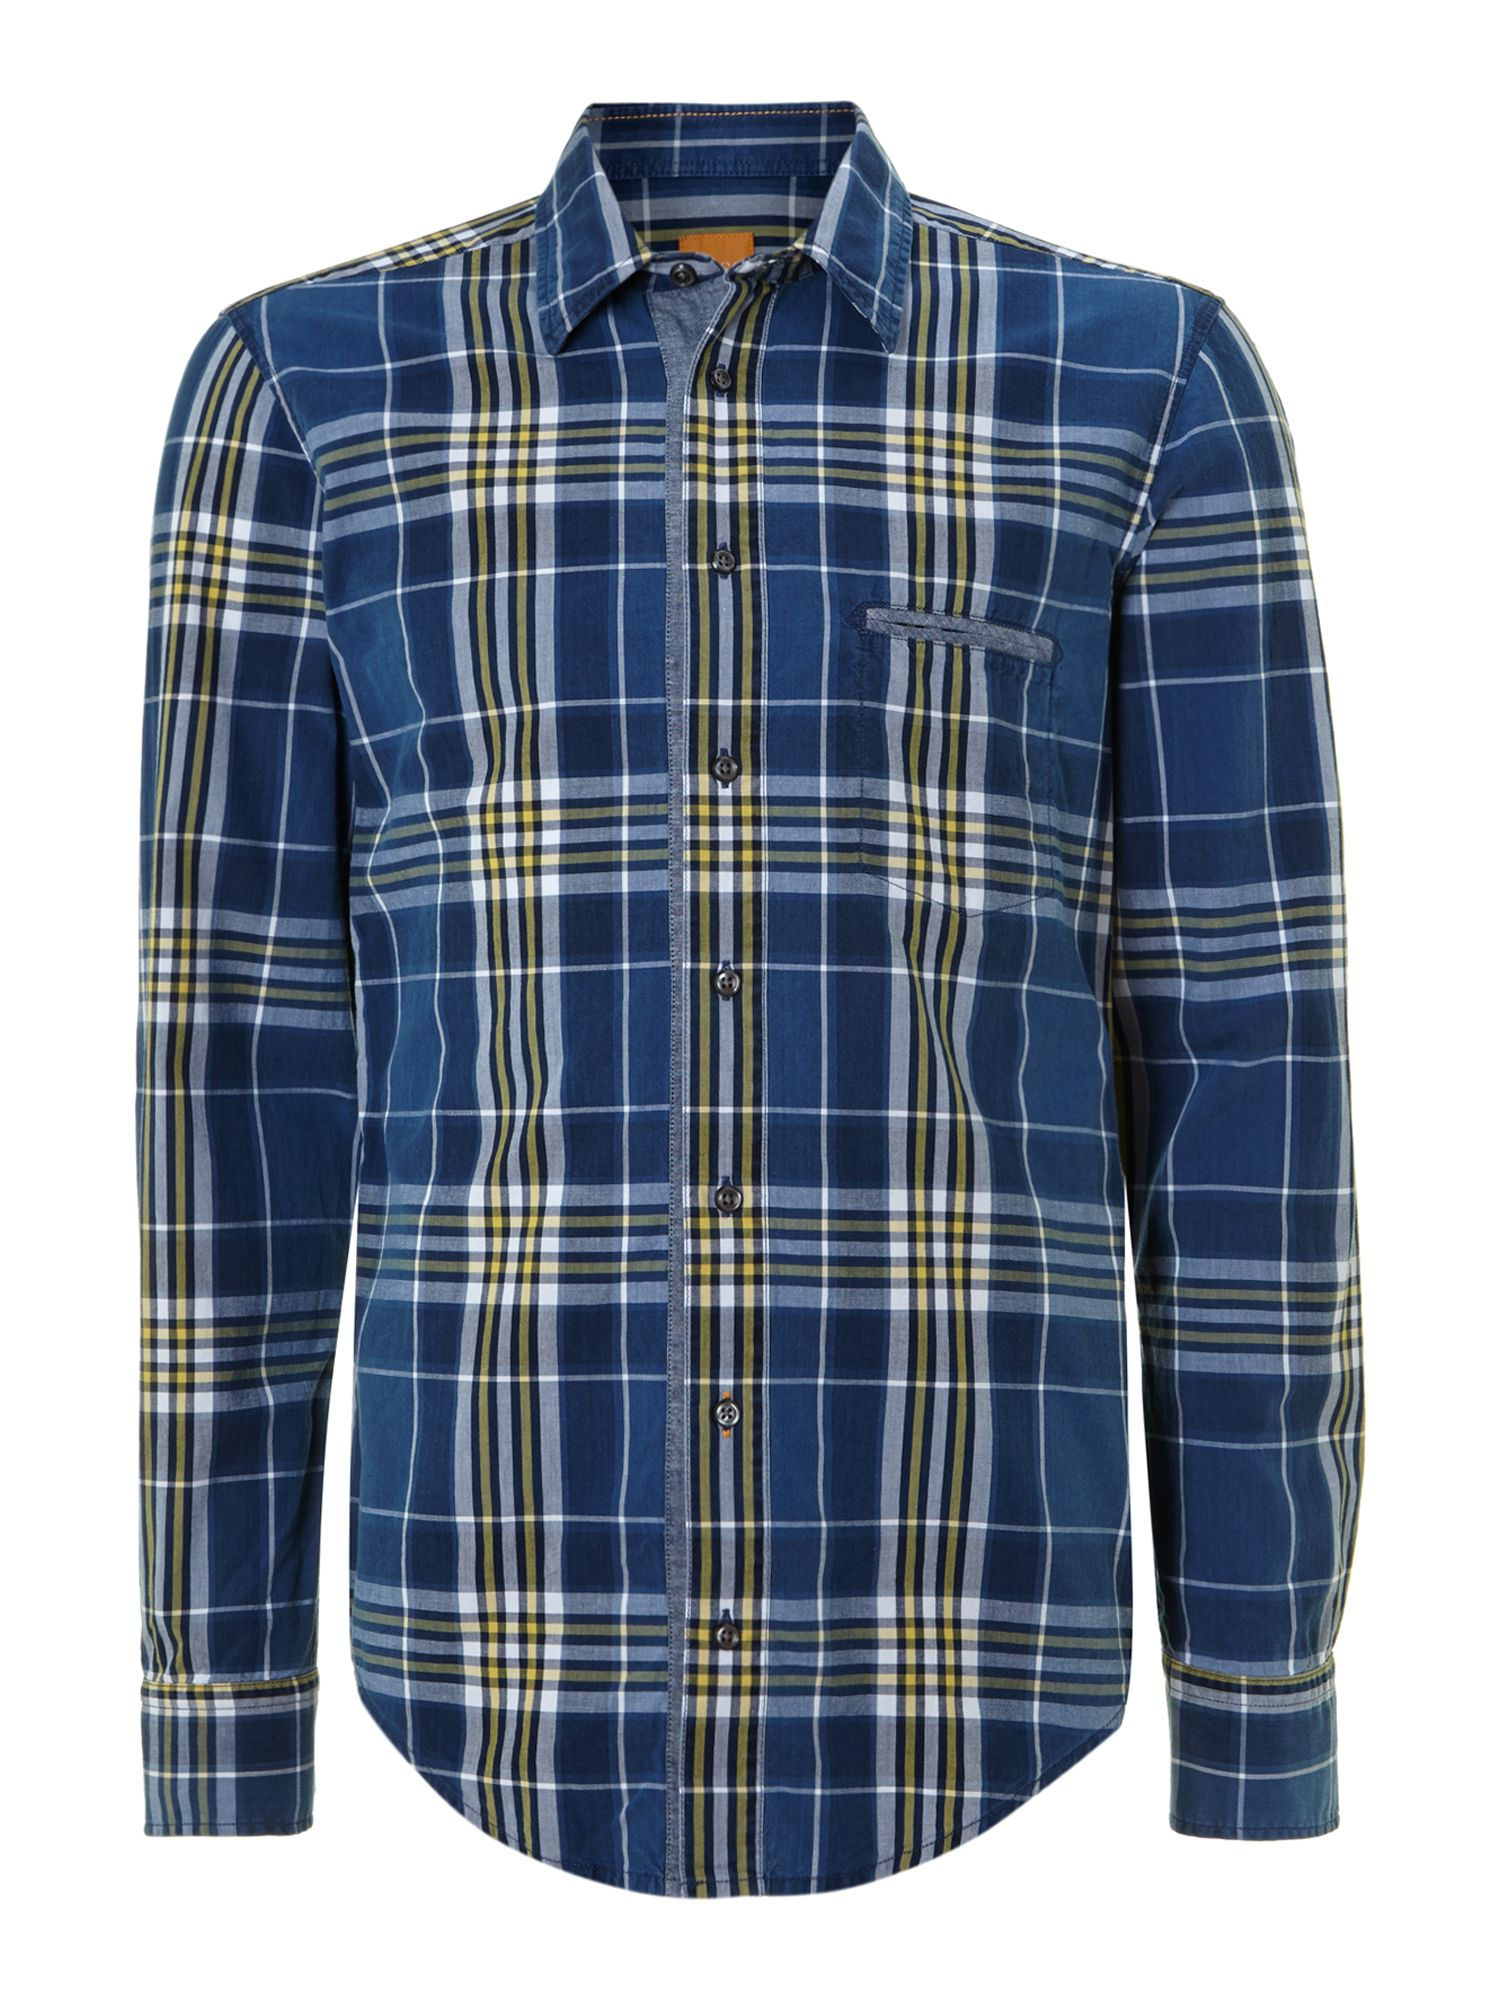 hugo boss blue check shirt in blue for men navy lyst. Black Bedroom Furniture Sets. Home Design Ideas